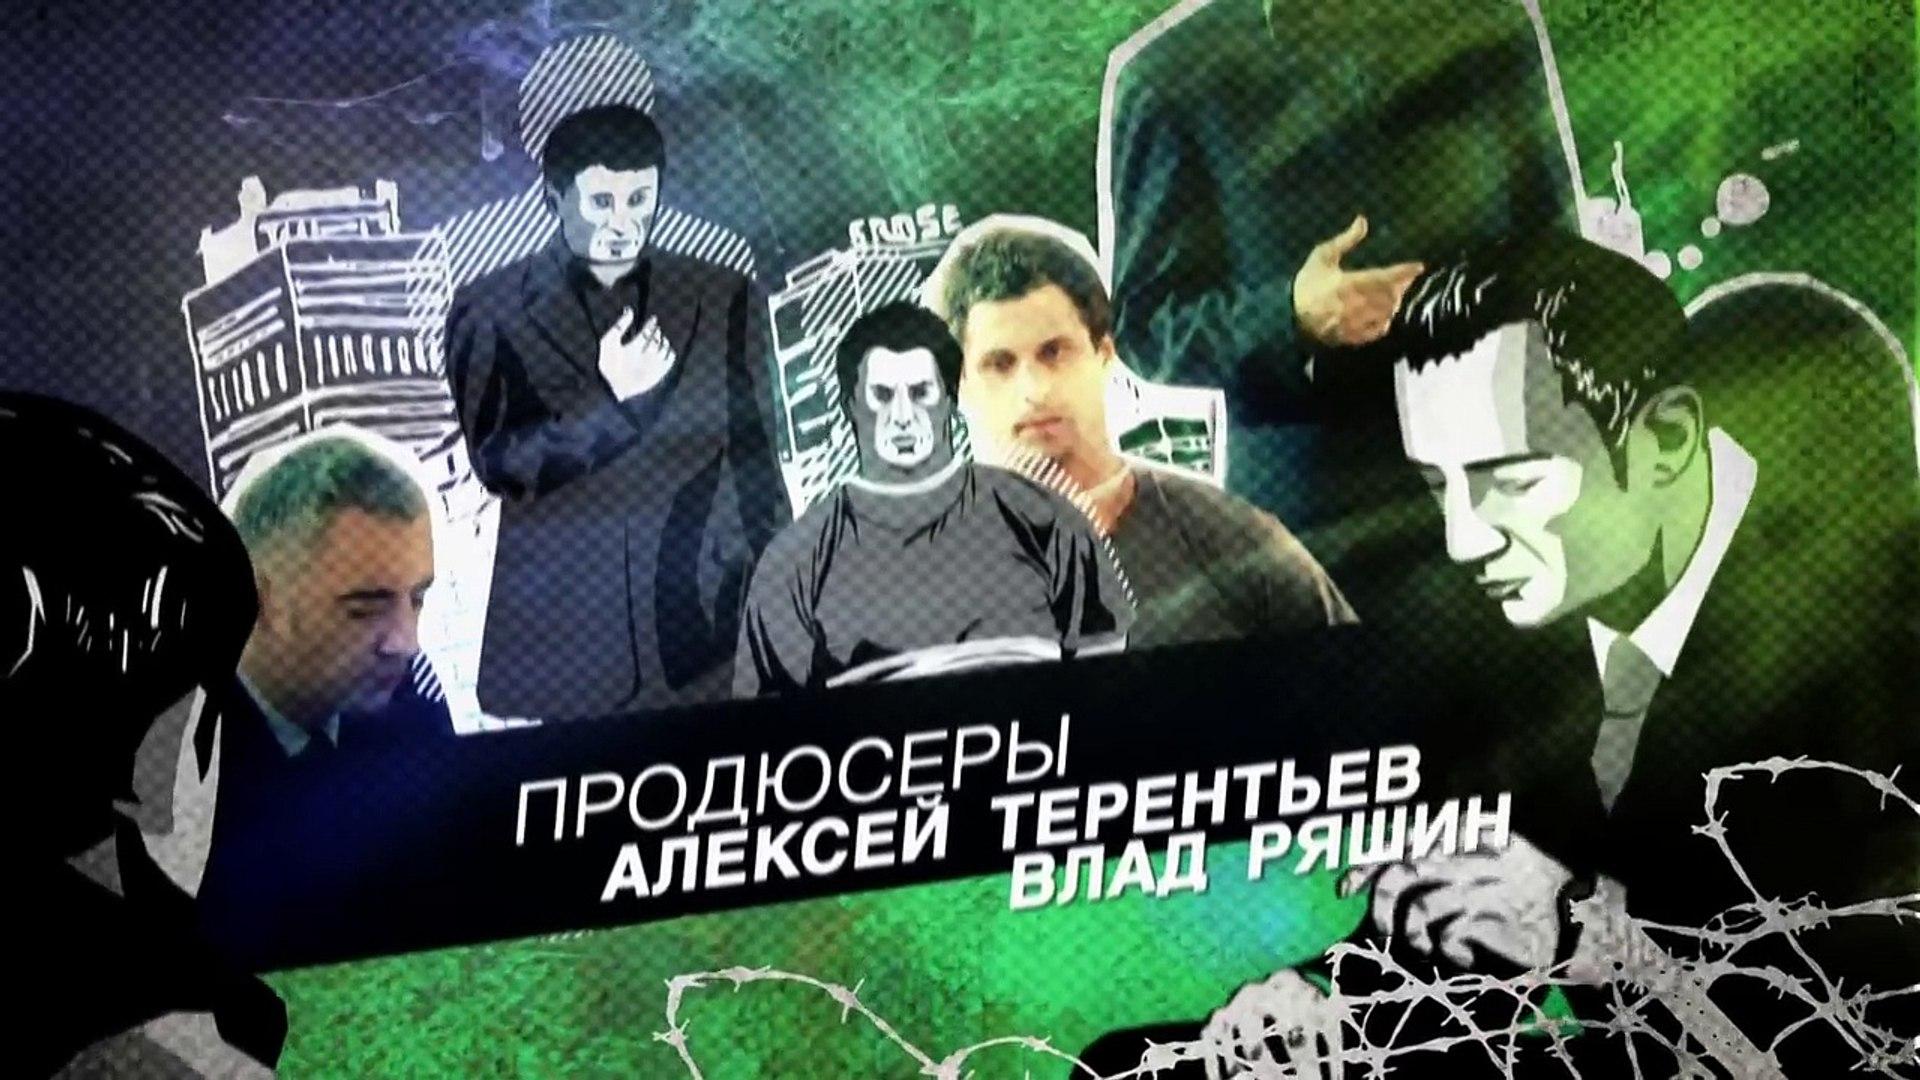 Кулинар. Сериал. Серия 2 из 20. Детектив 2018 russkie detektivi seriali 2018